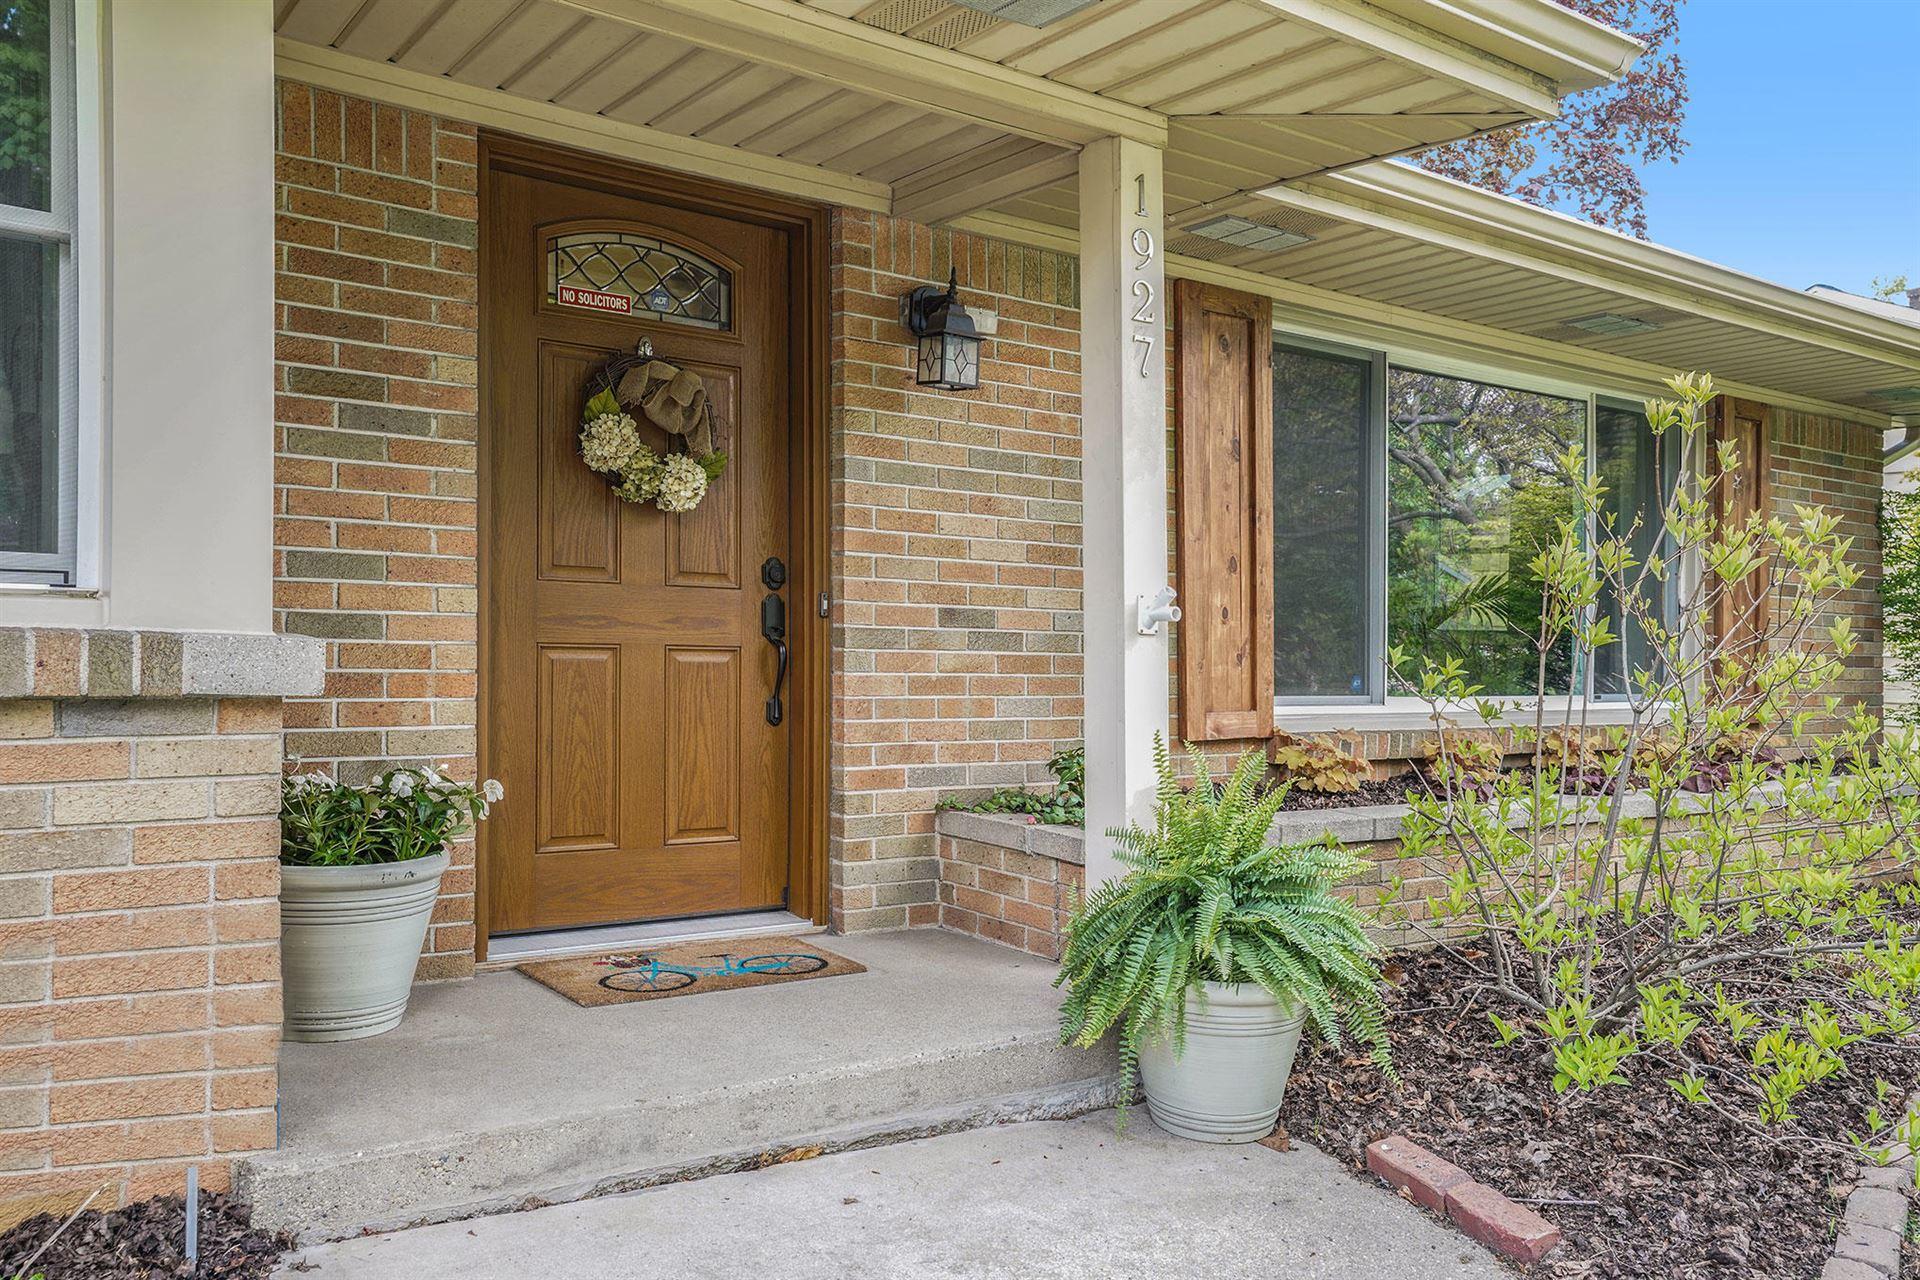 1927 Houseman Avenue NE, Grand Rapids, MI 49505 - MLS#: 21016313